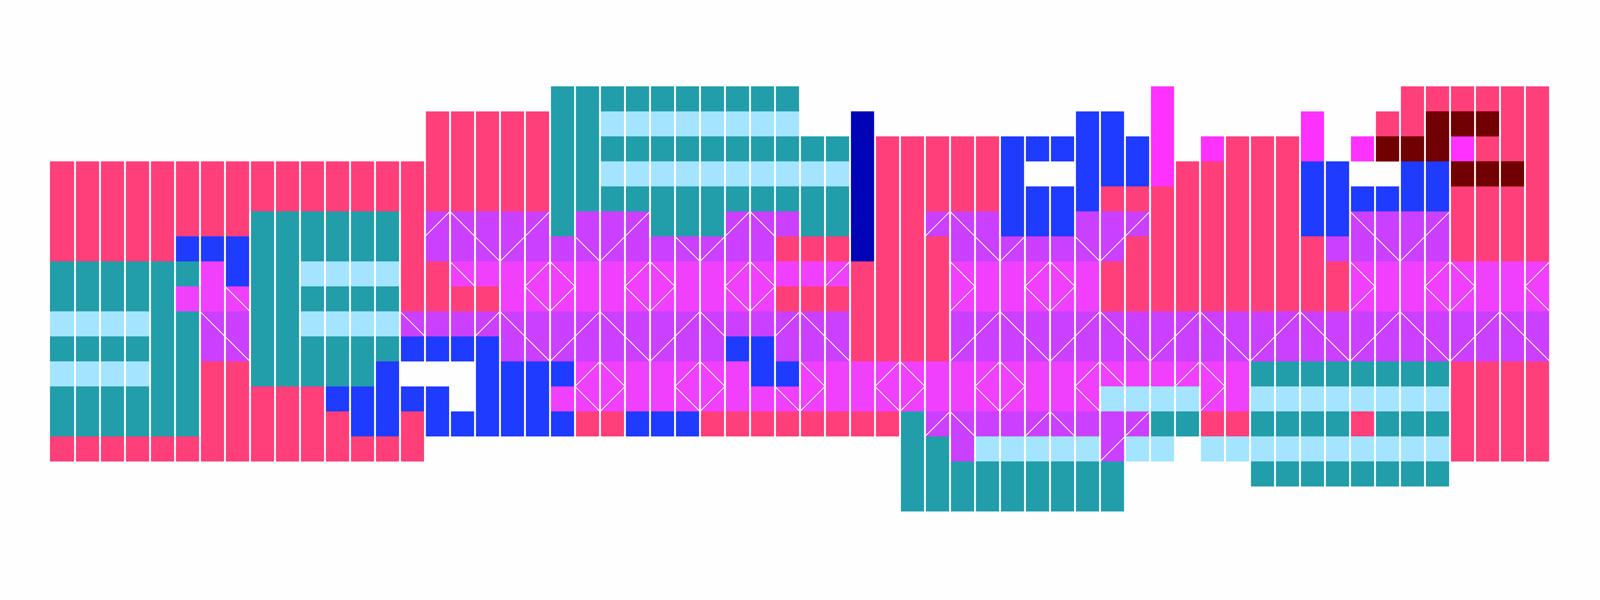 MUSIKHOCHSCHULE, 64 x 31, Digitaldruck auf Alutafeln, 2013